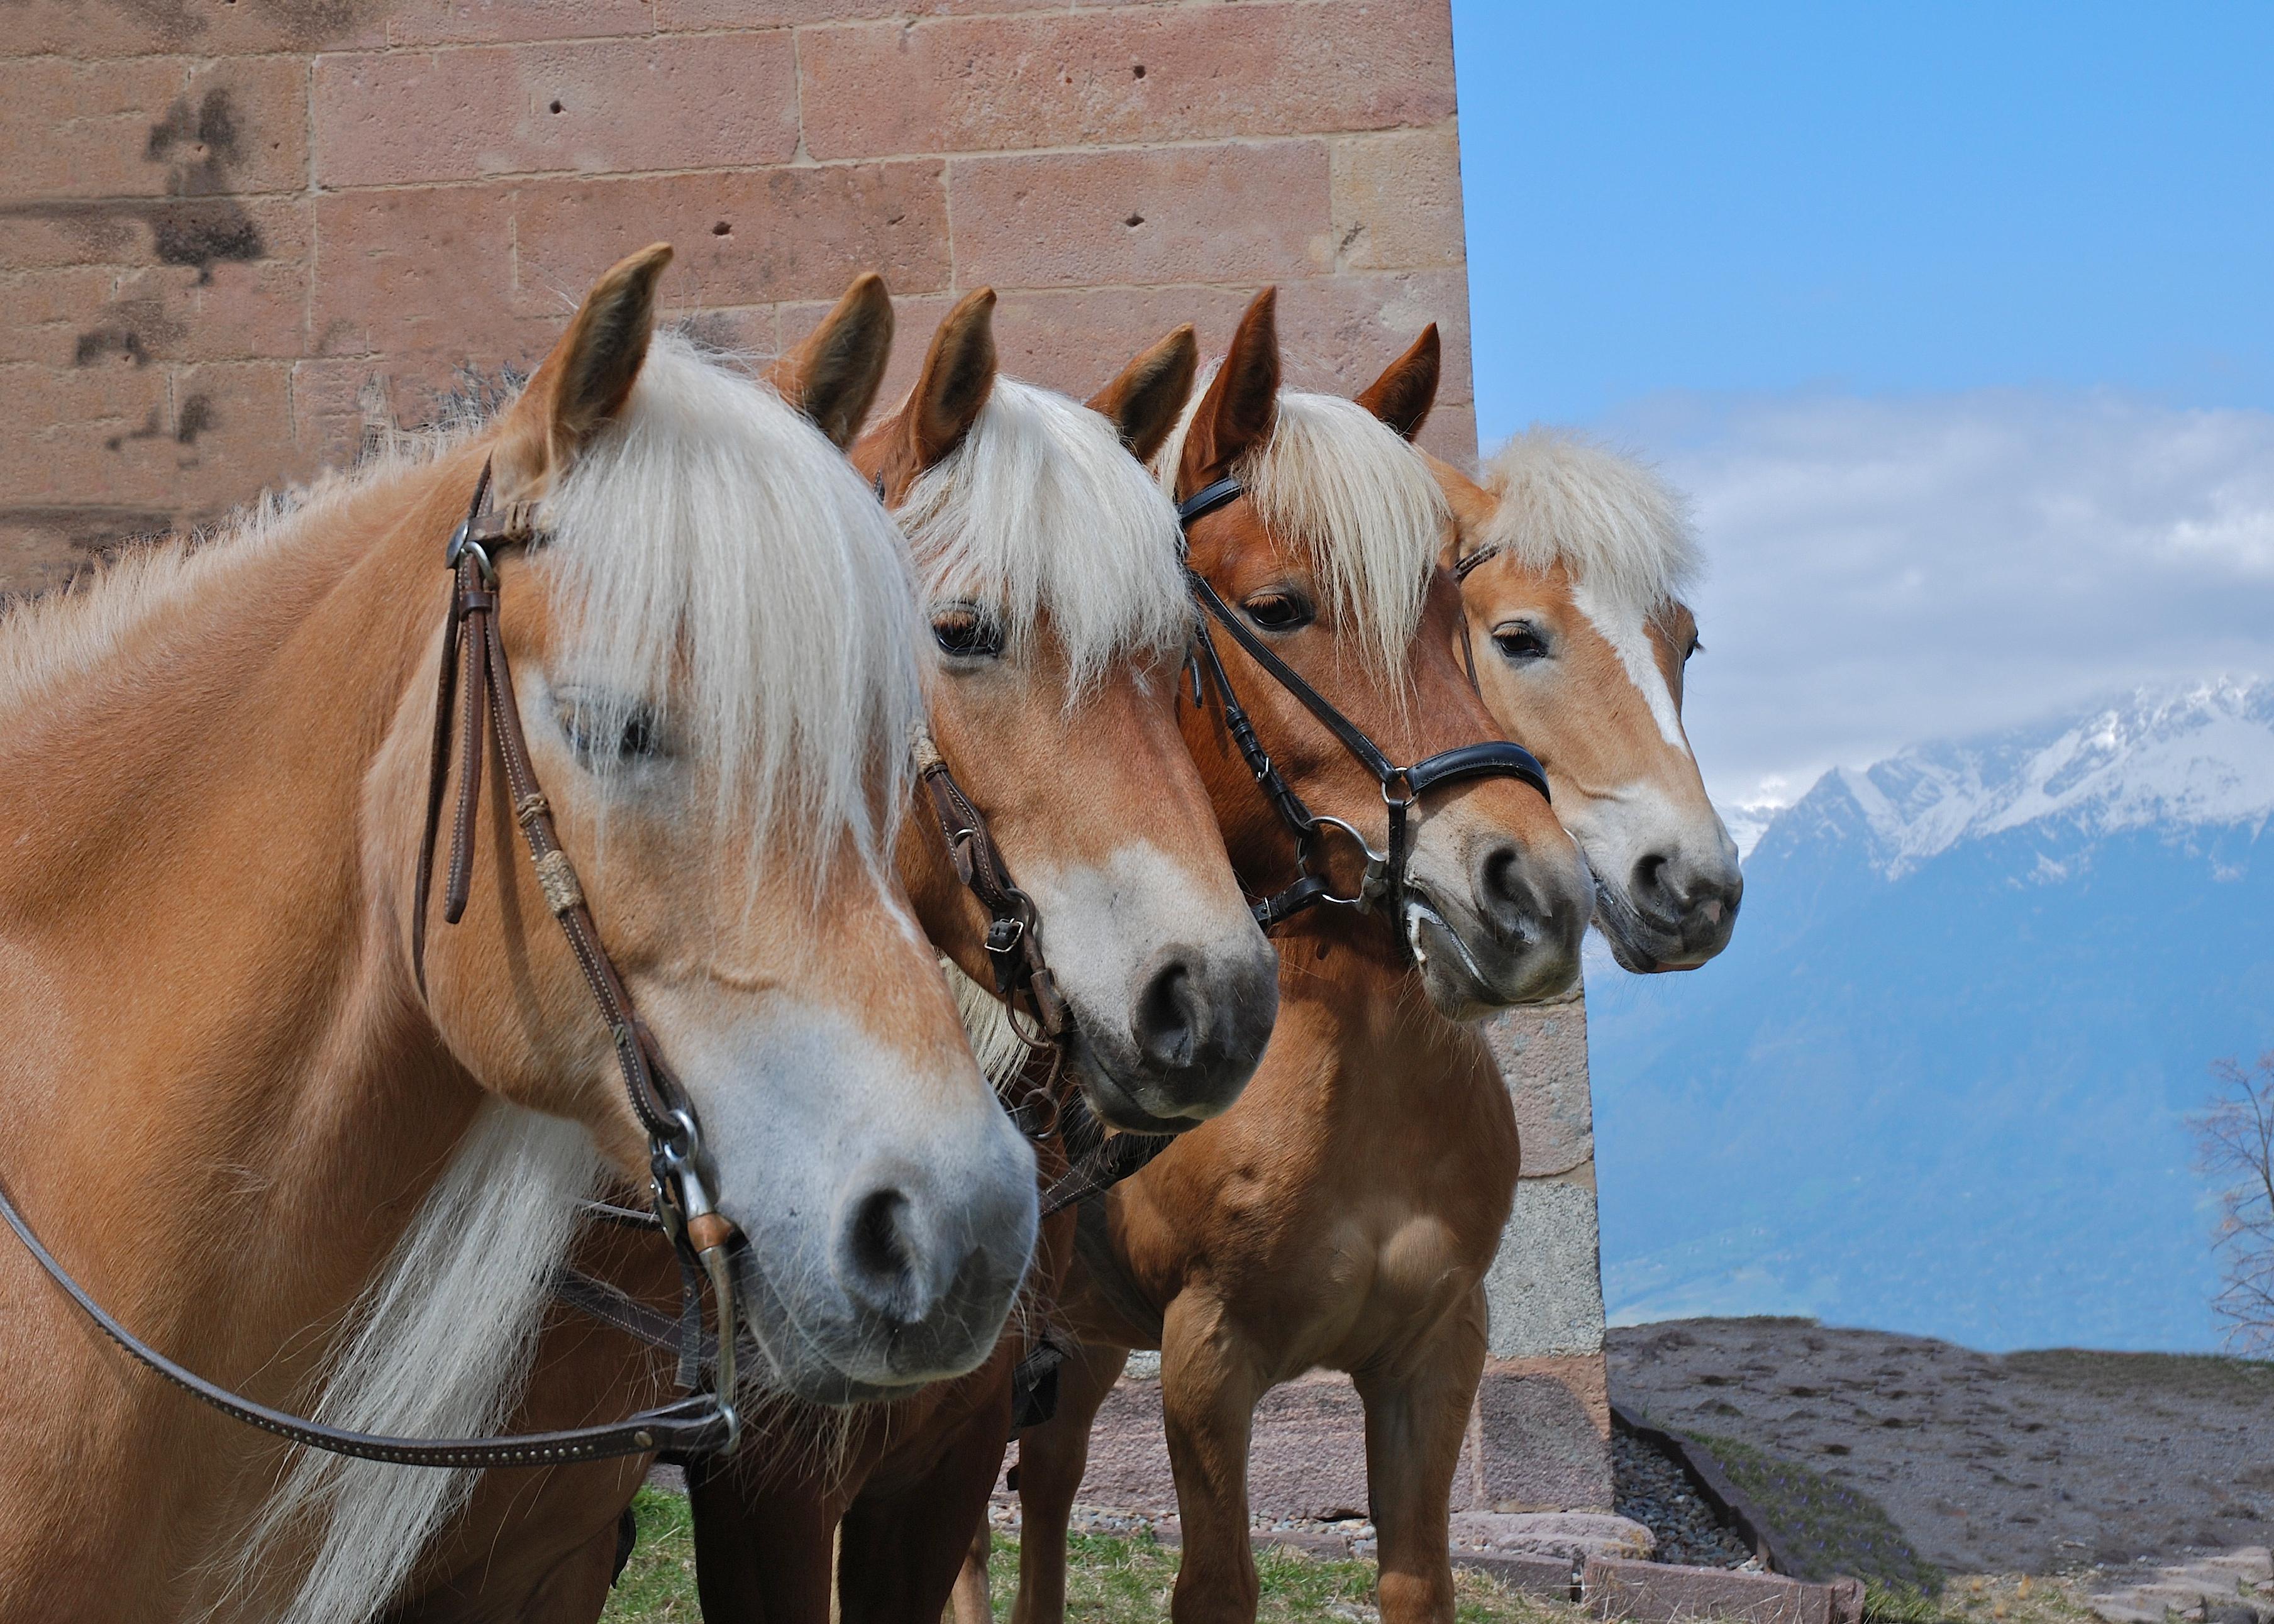 http://upload.wikimedia.org/wikipedia/commons/9/9b/Hafling_Horses.jpg